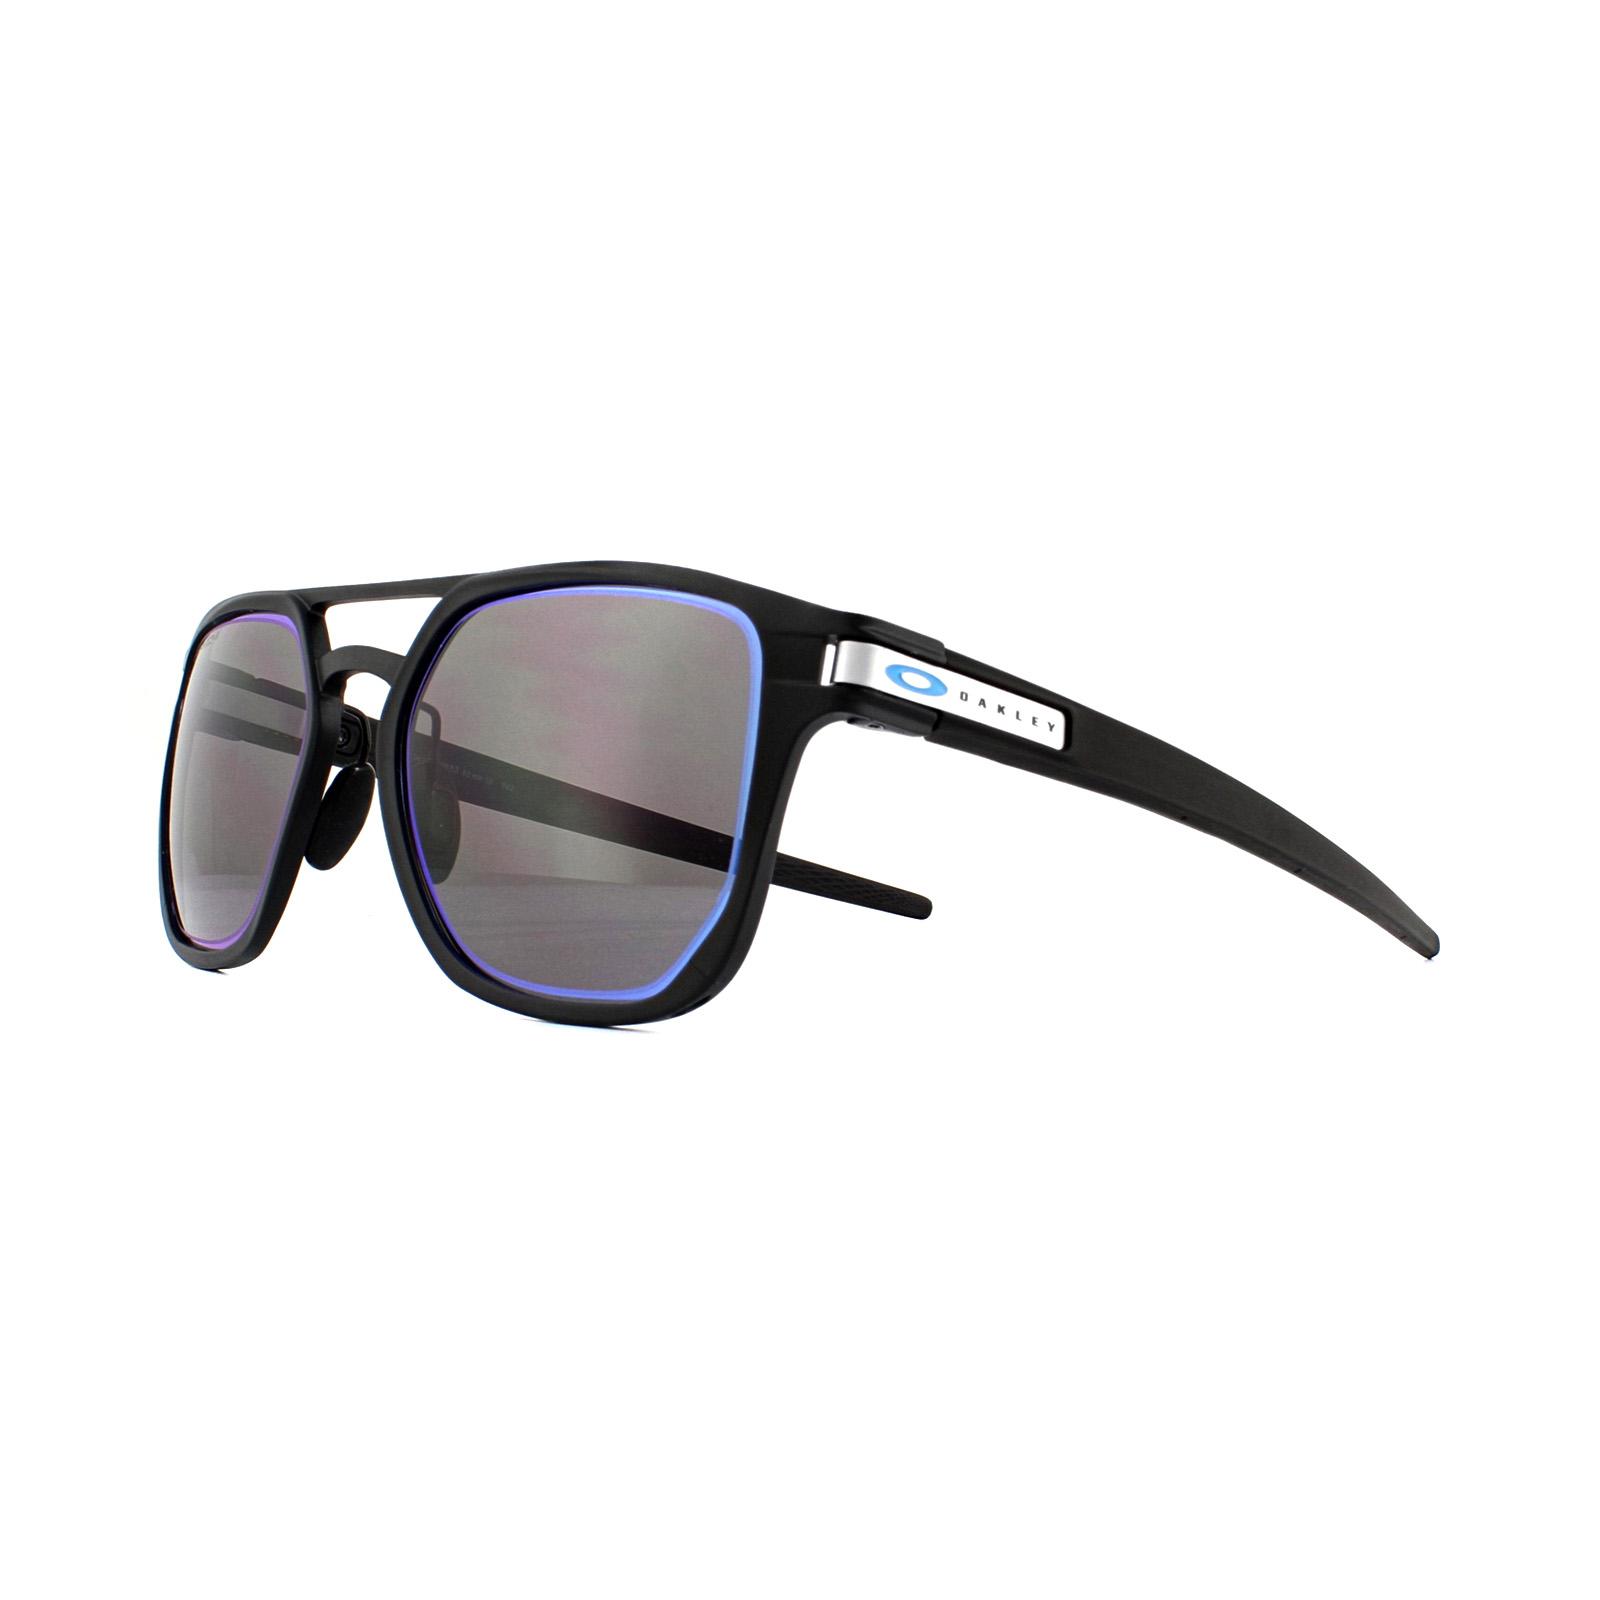 e3ba2e4bb93d Cheap Oakley Latch Alpha Sunglasses - Discounted Sunglasses